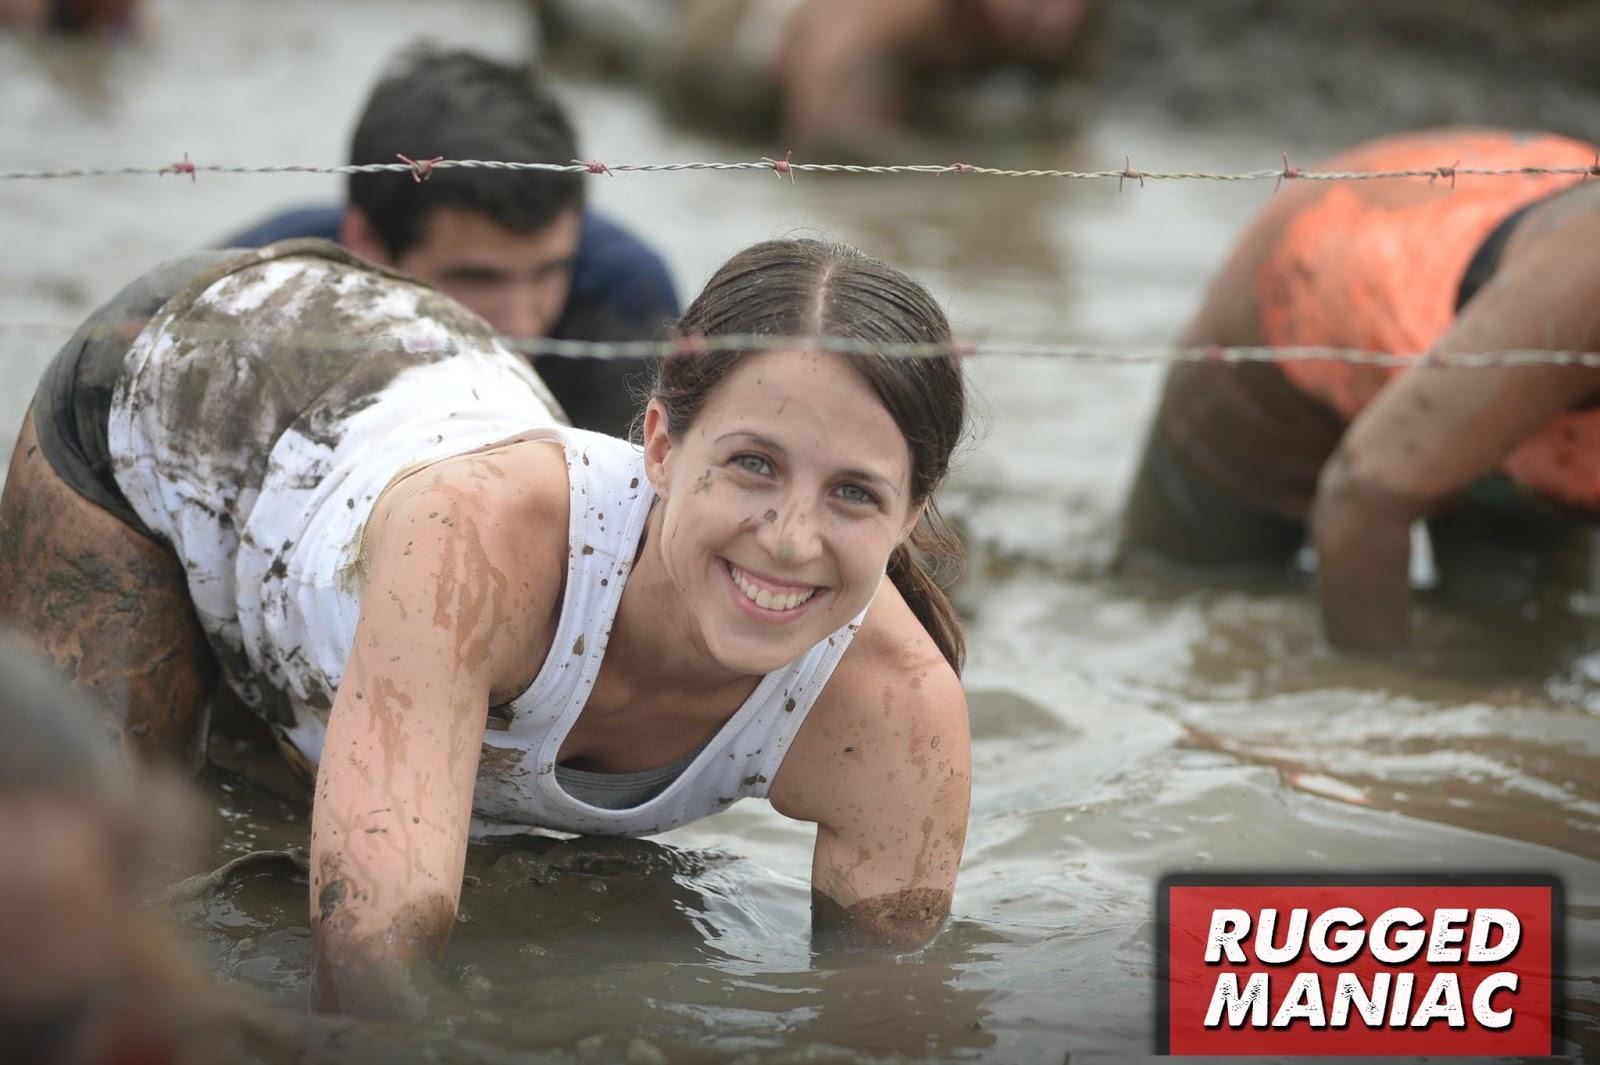 Race Recap Rugged Maniac Arizona Mud Run Obstacle Course